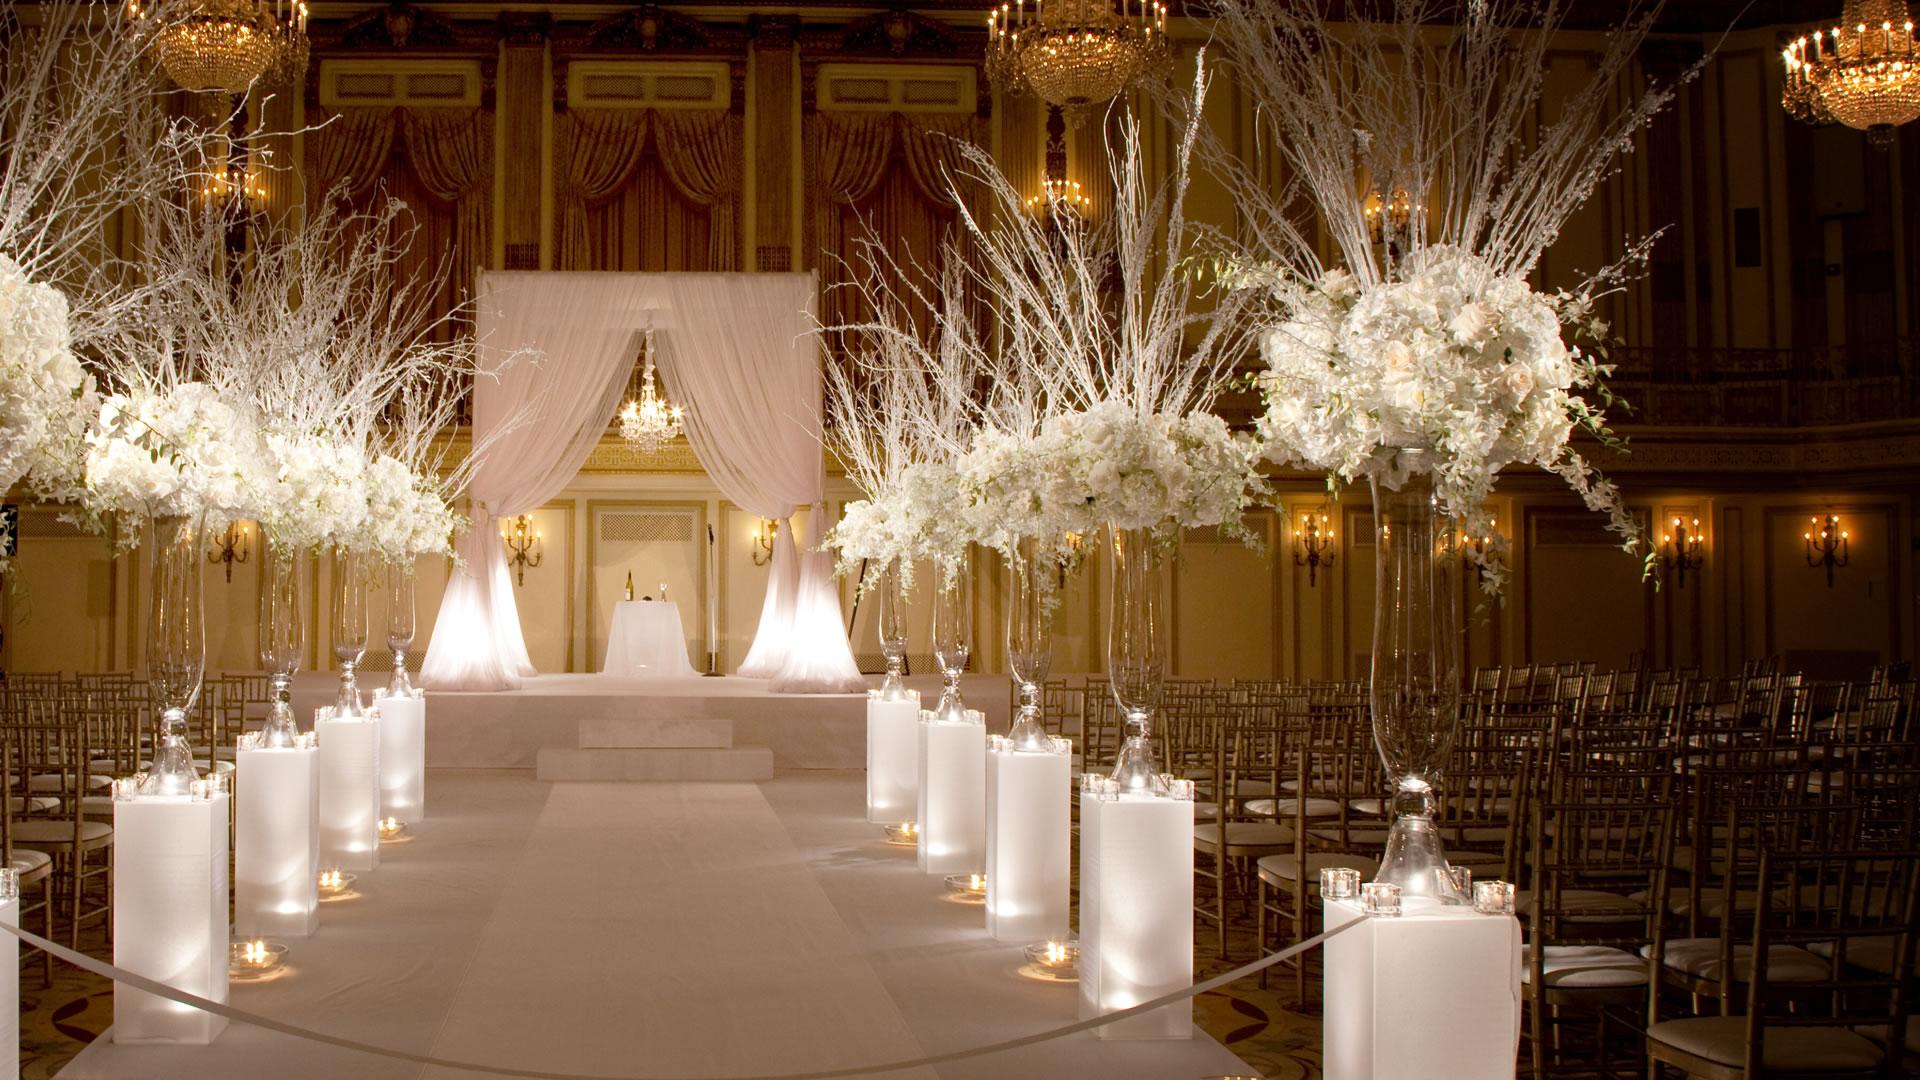 wedding reception stuart moorat - HD1920×1080